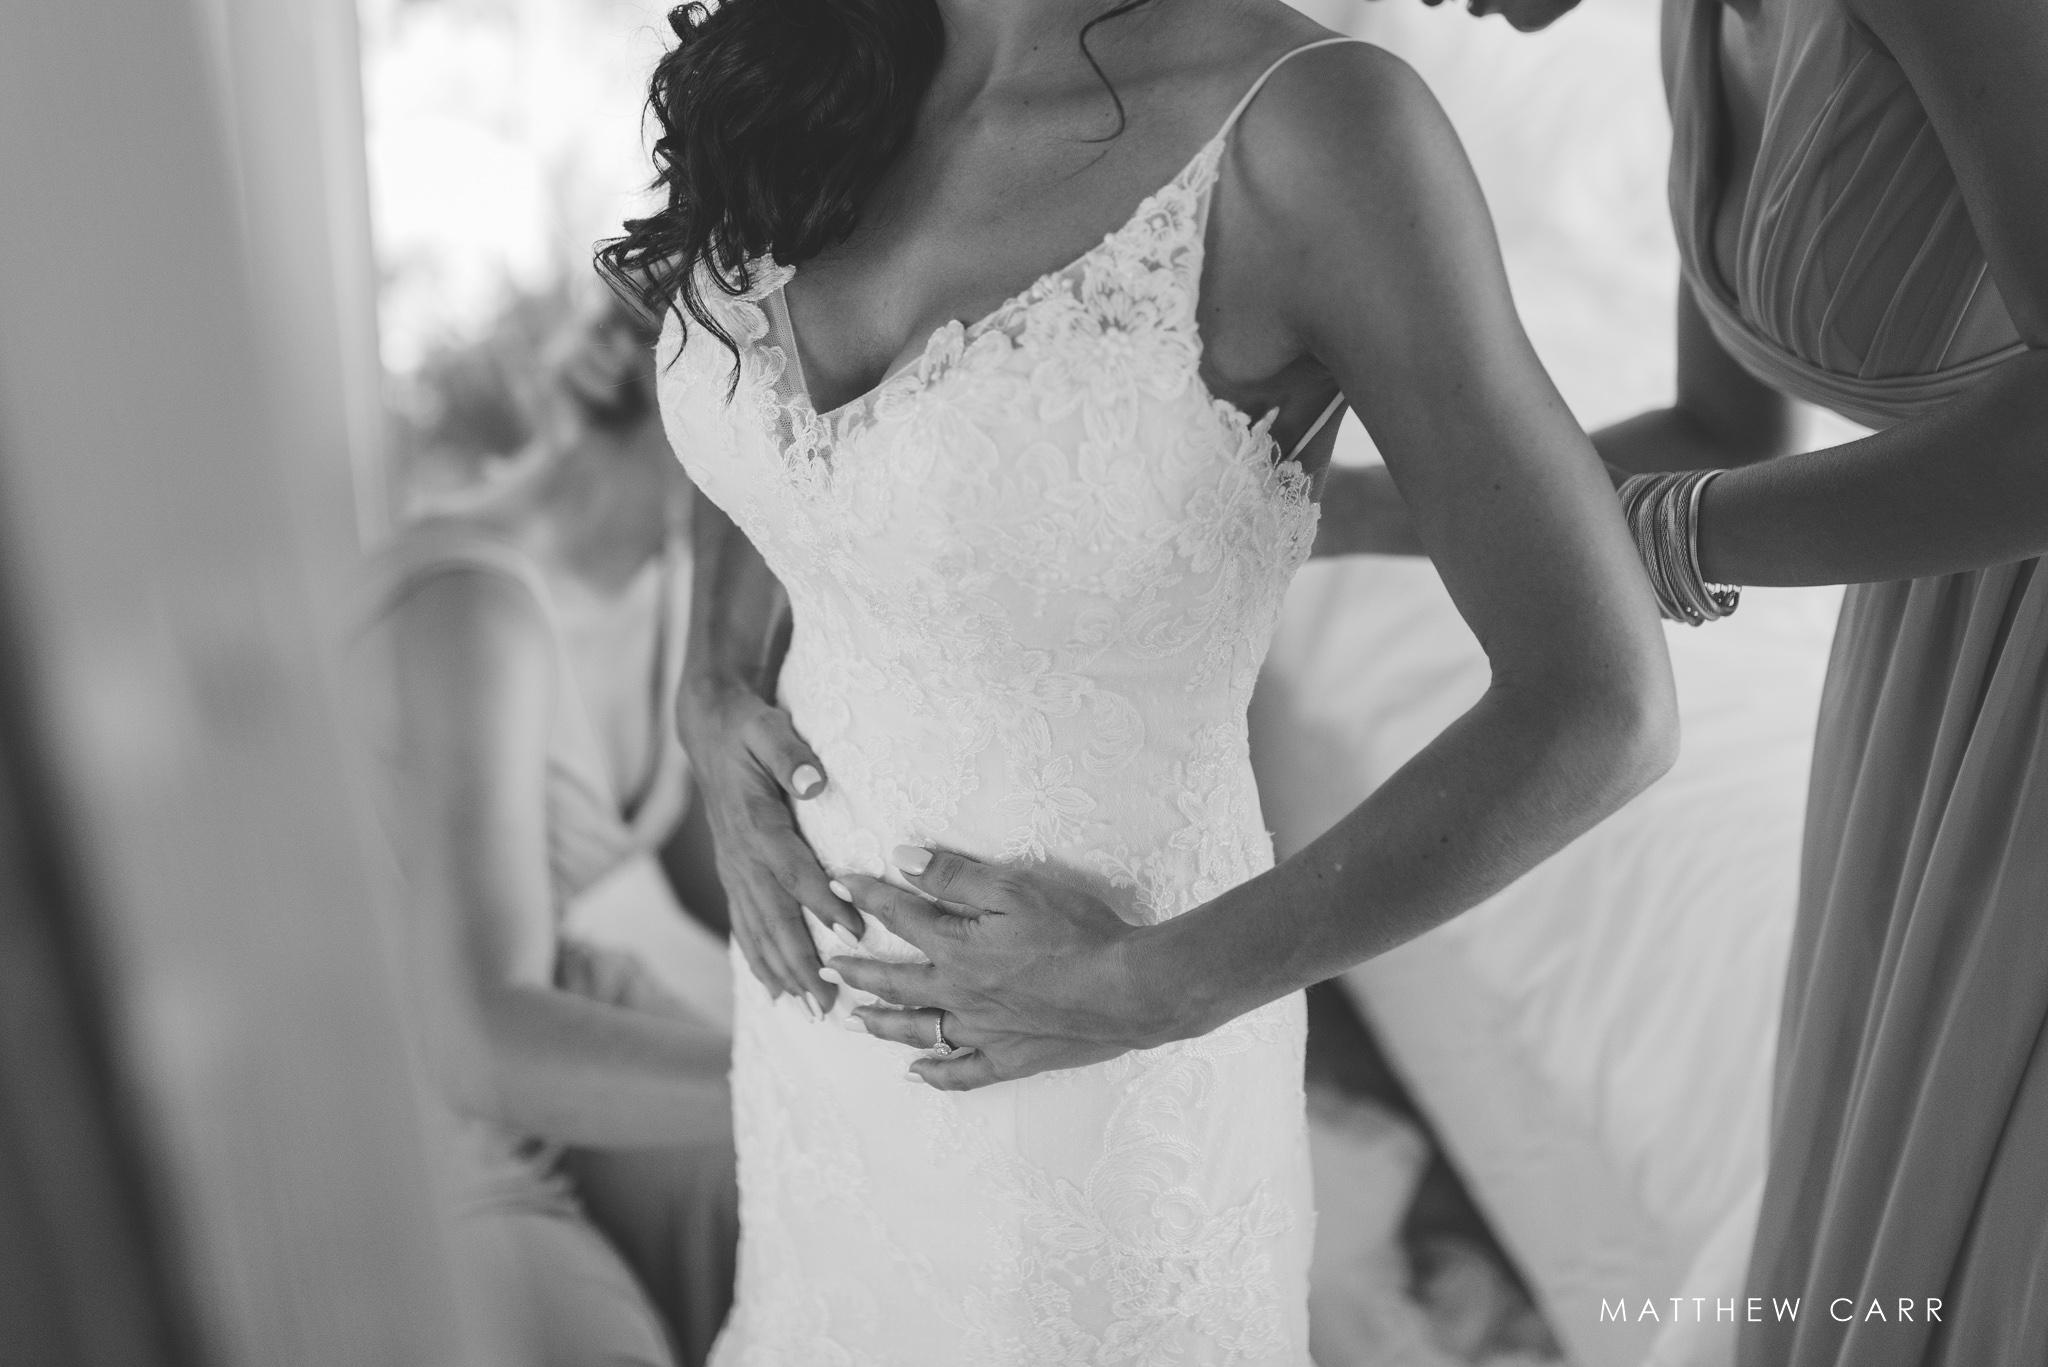 wedding prep - low res (viewing, social media) (219 of 276).JPG